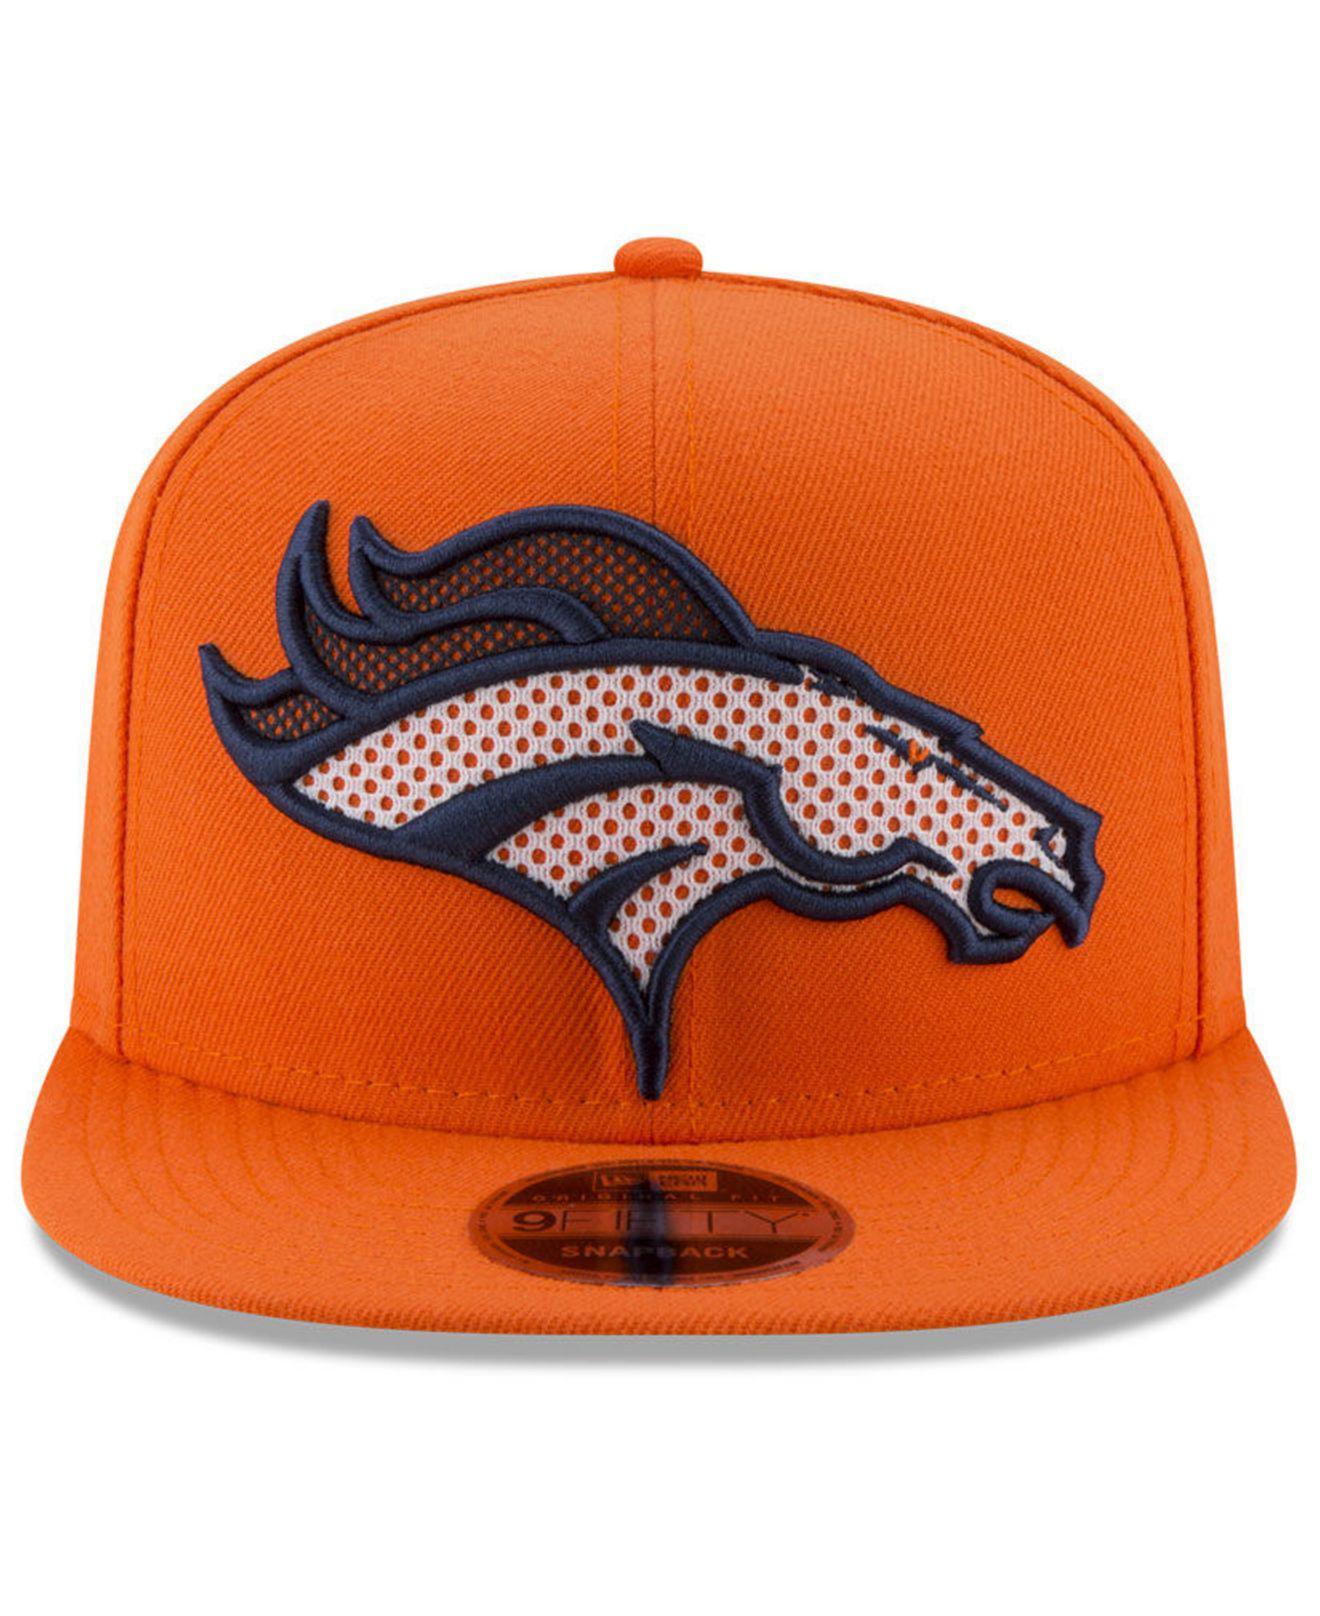 Lyst - KTZ Denver Broncos Meshed Mix 9fifty Snapback Cap in Orange for Men dcd3c7e402d6